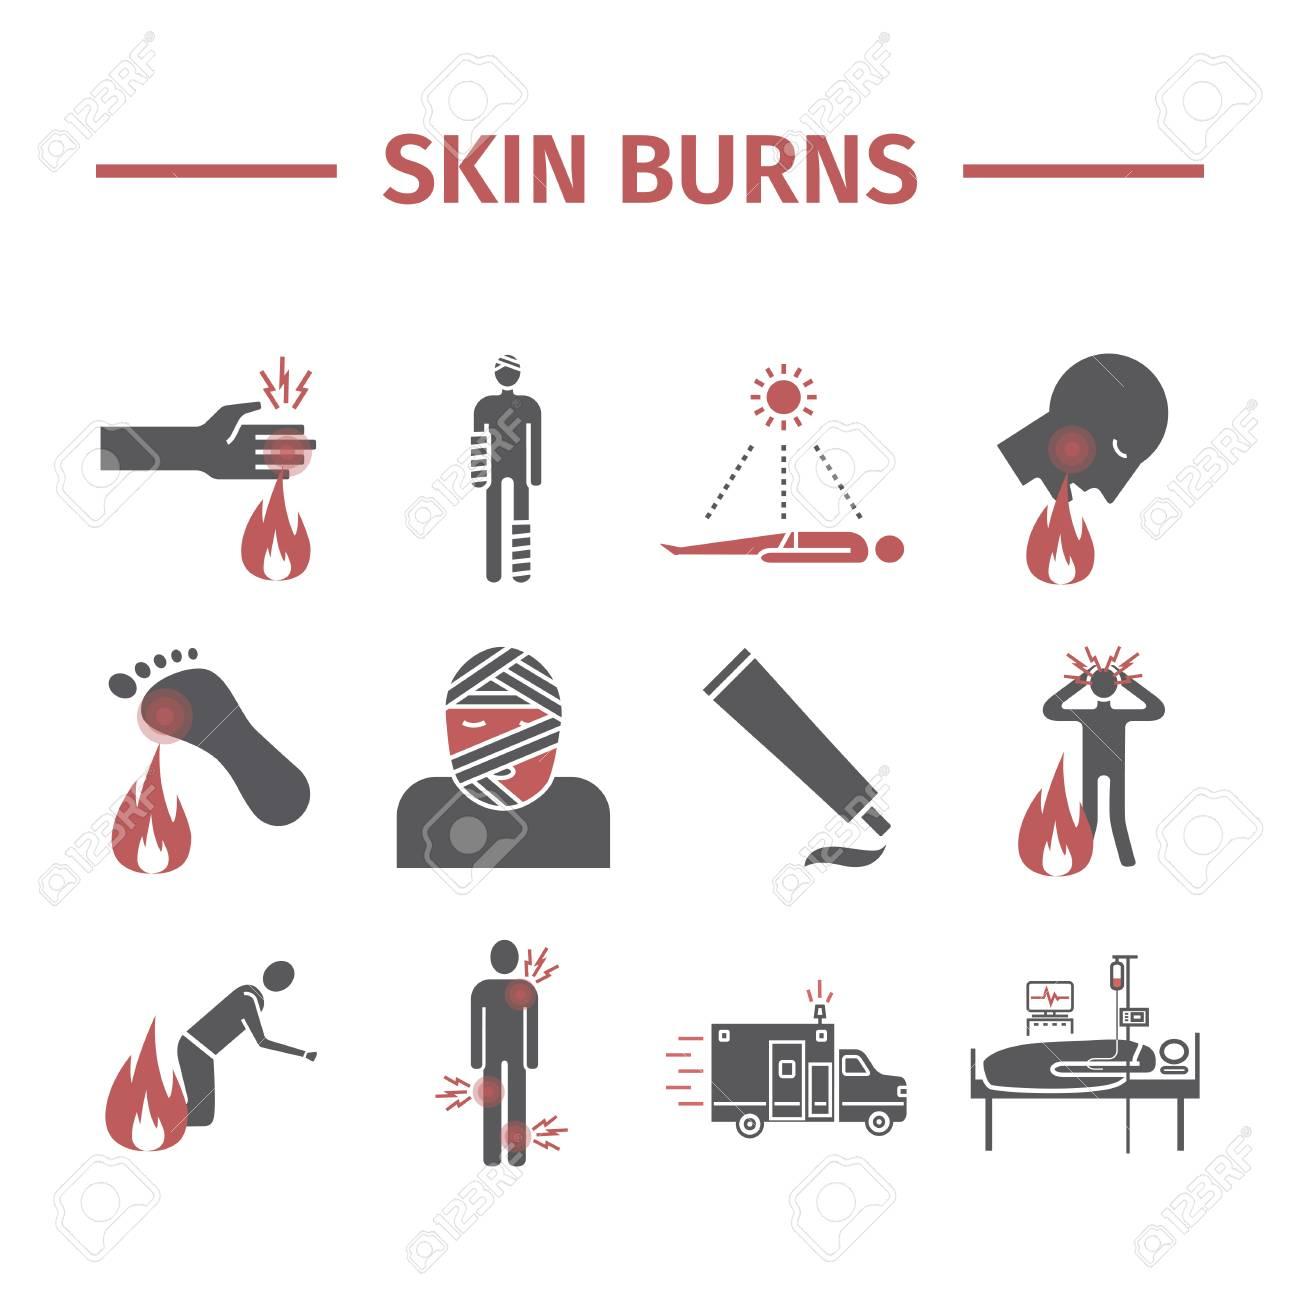 Skinl Burns kine icons. Treatment. - 104828108